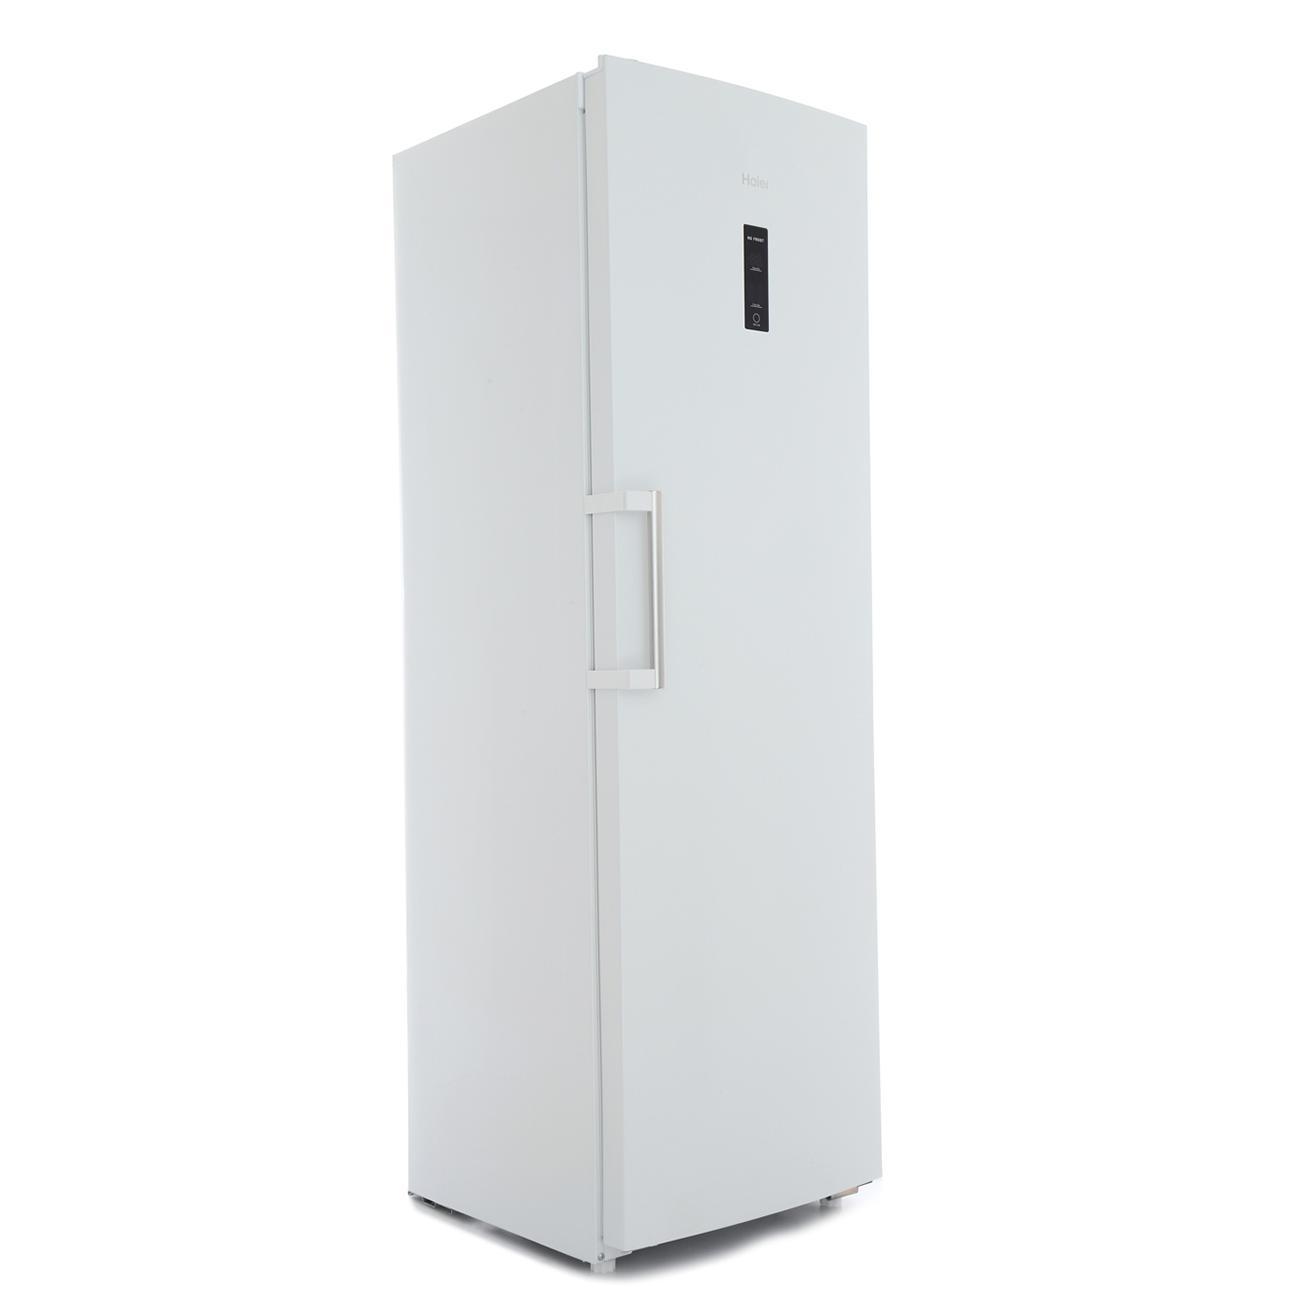 Haier HF-255WAA Frost Free Tall Freezer